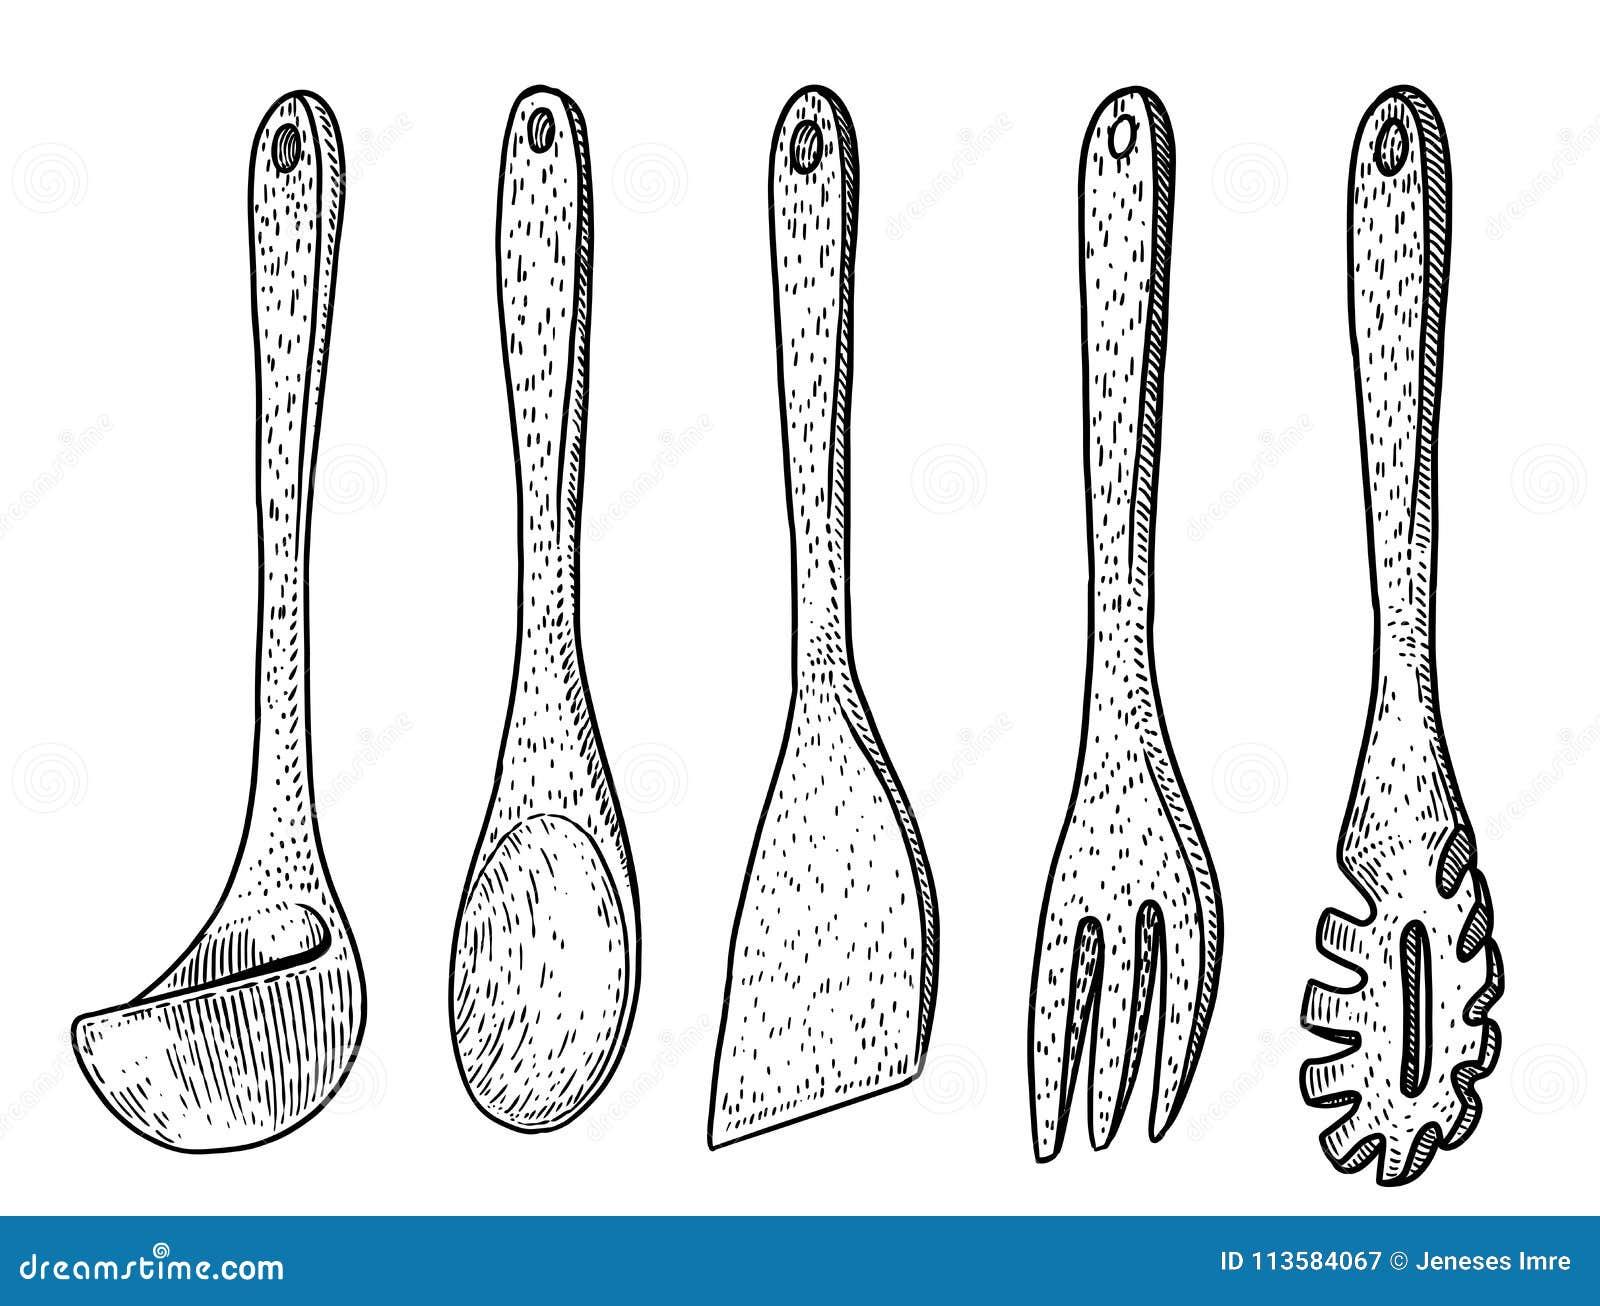 Ice Cream Scoop Spoon Illustration Drawing Engraving Line Art VectorWooden Kitchen Tool